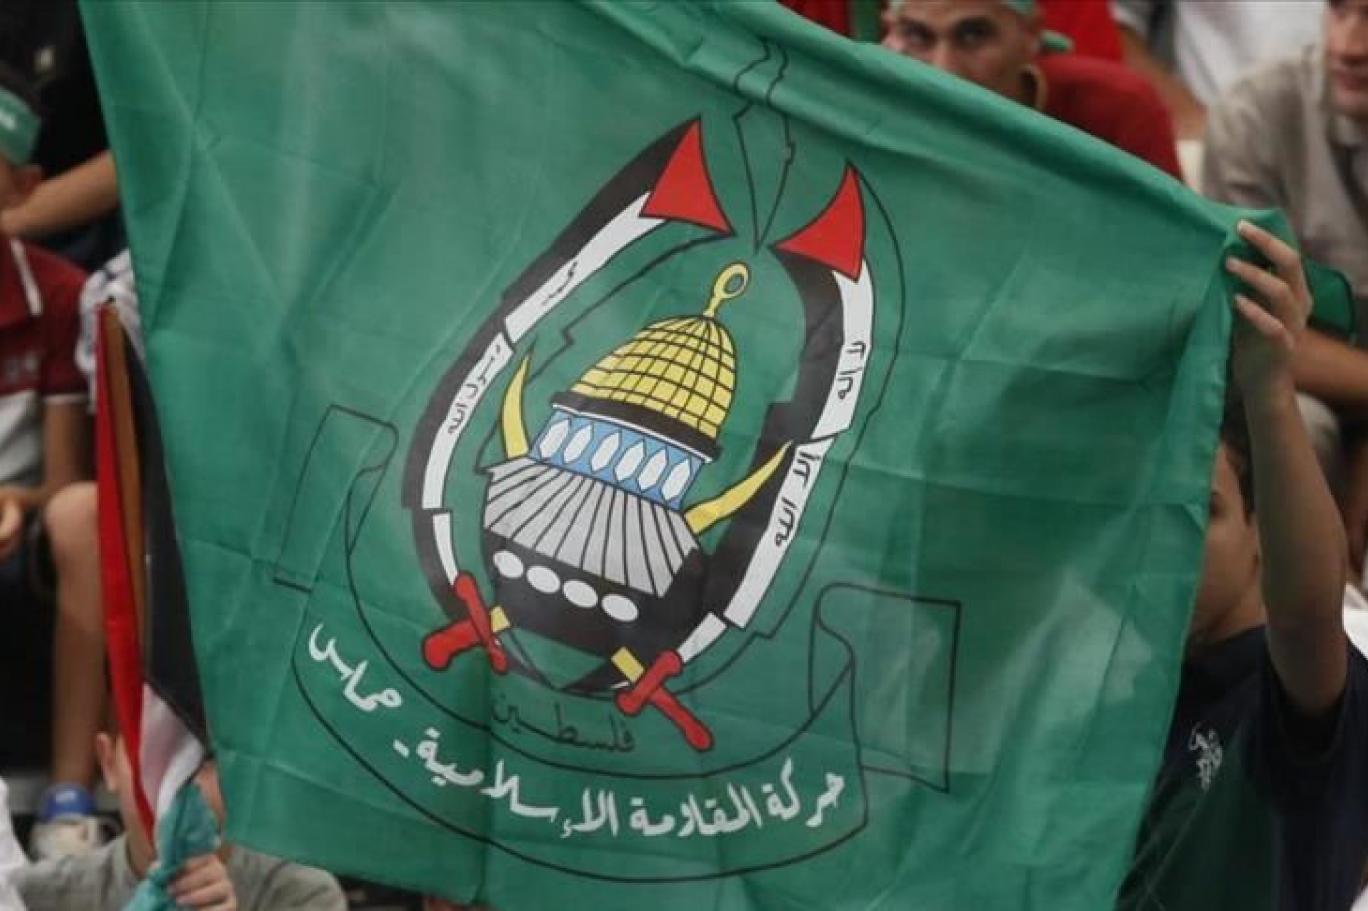 İsrailliler: HAMAS'a Teslim Oldunuz